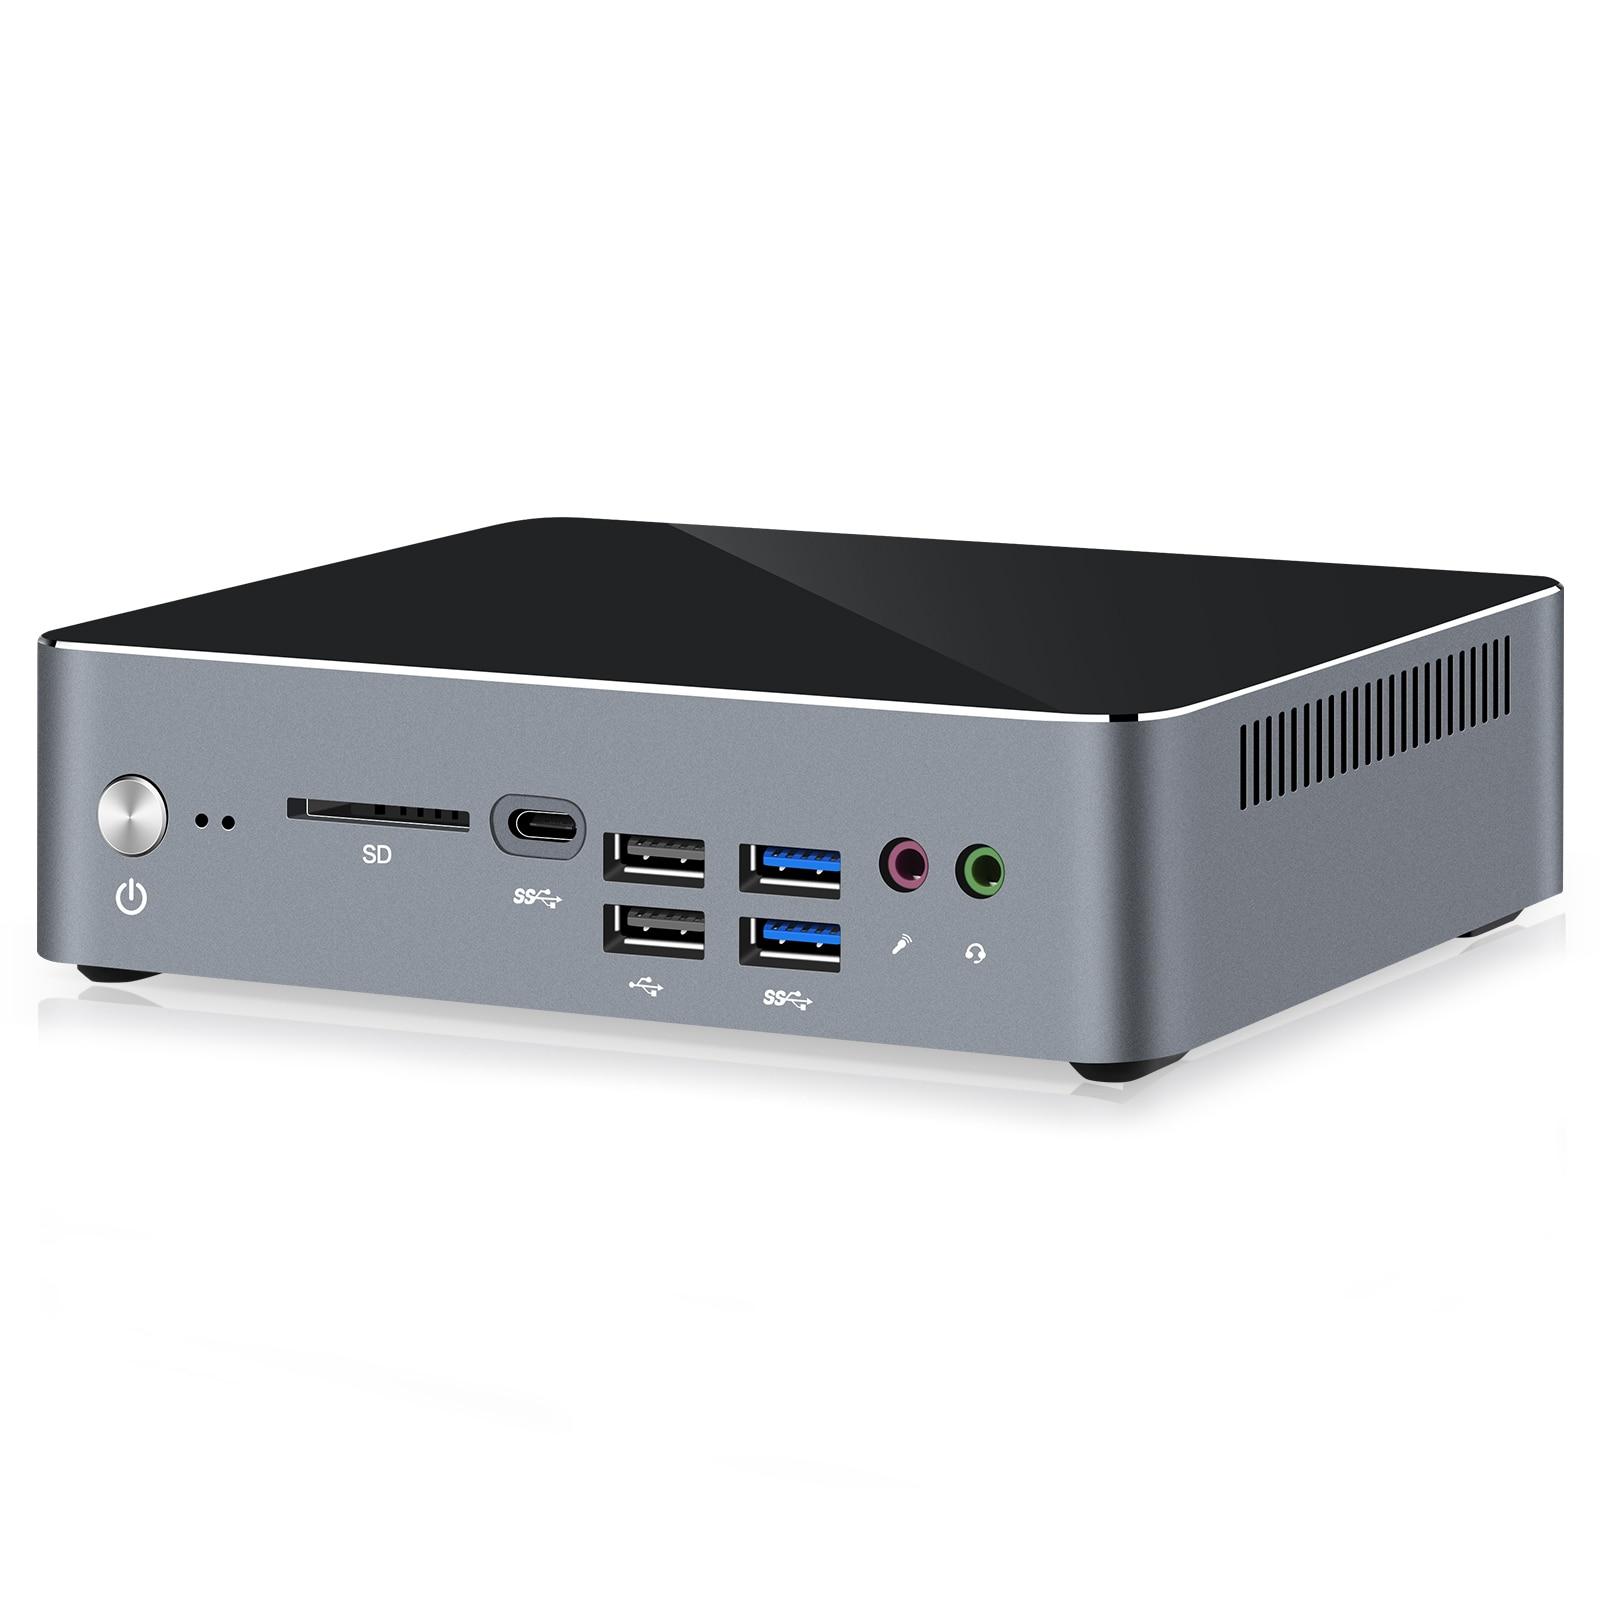 Chatreey mini pc KC10 intel 10th core i5 10210u i7 10510u windows 10 pro  DDR4 desktop gaming  computer Nvme SSD 1